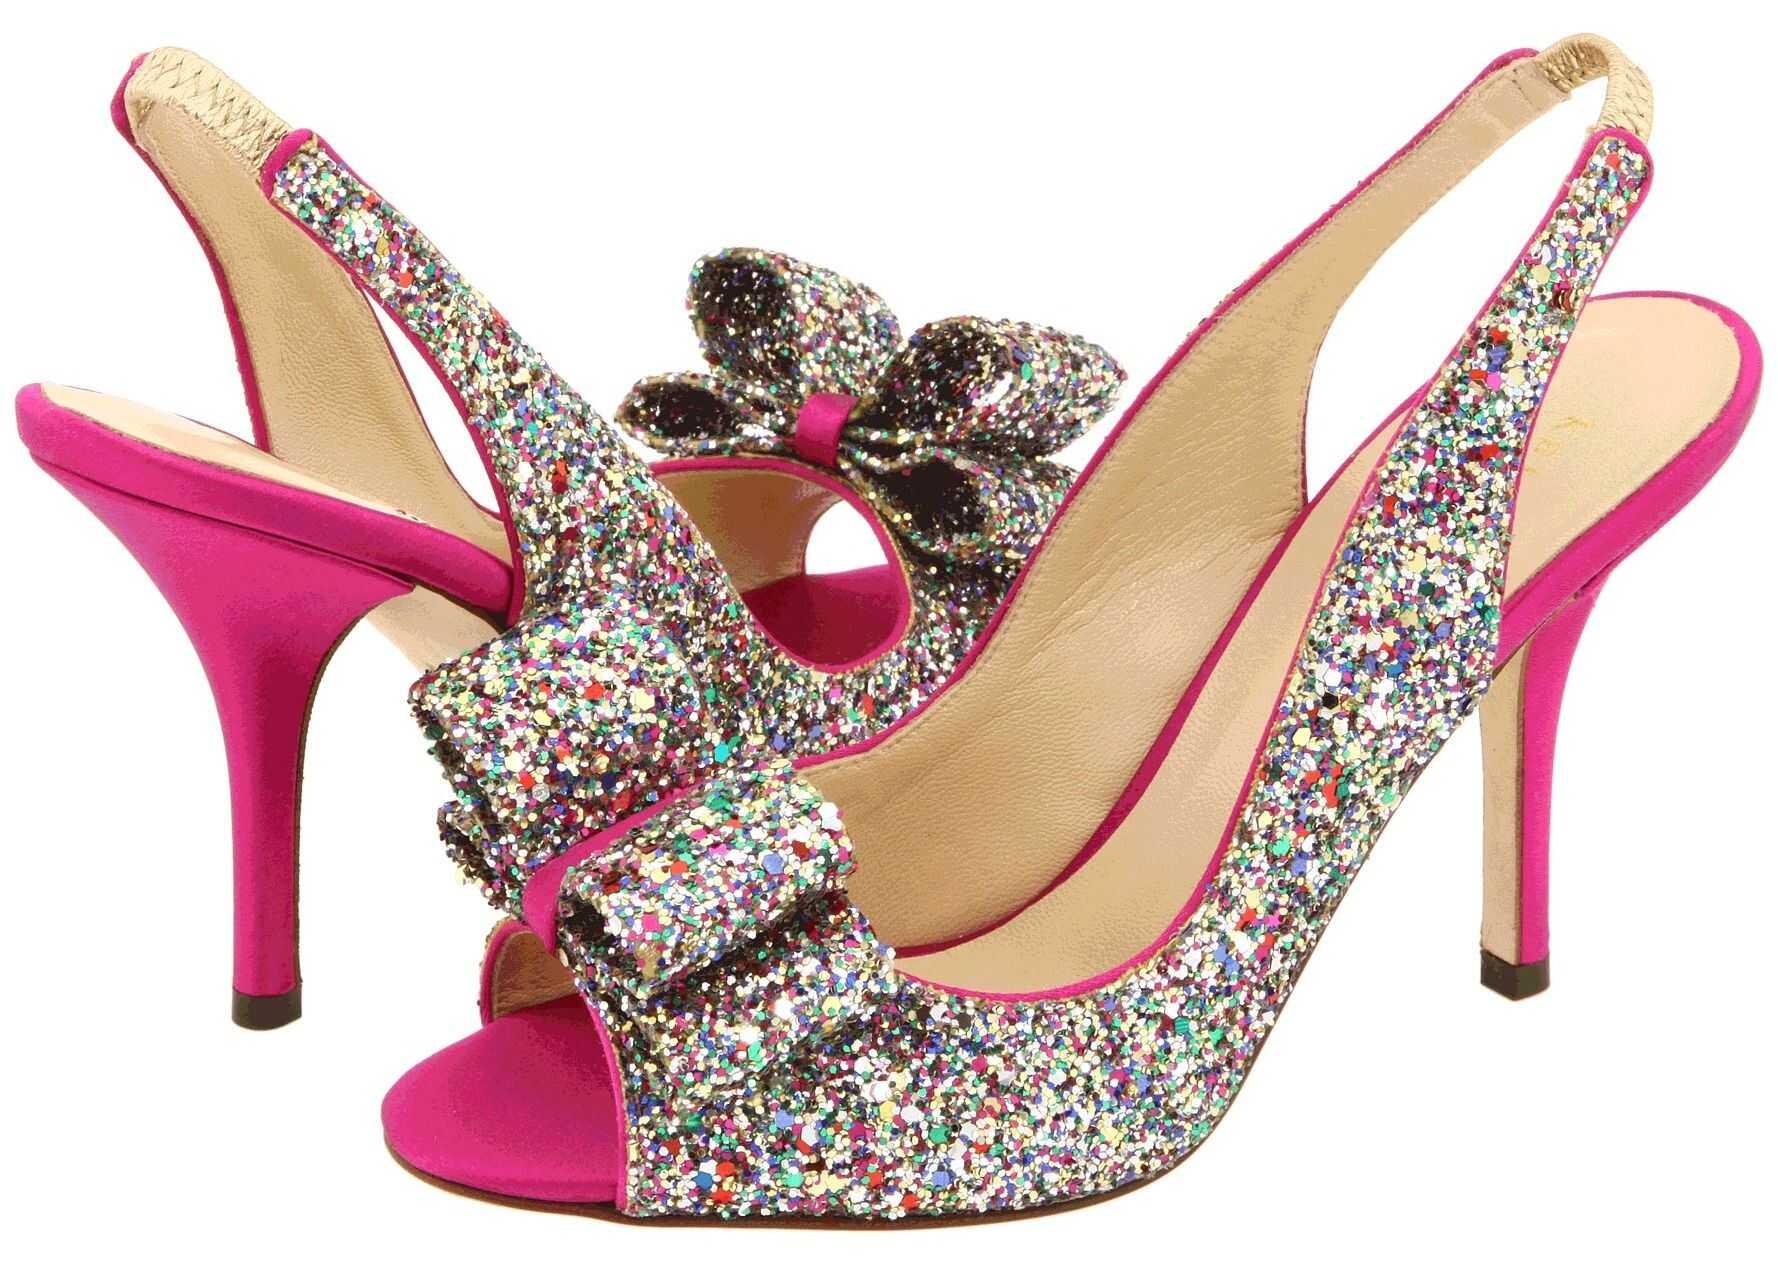 Kate Spade New York Charm Heel Multi Sparkle Glitter